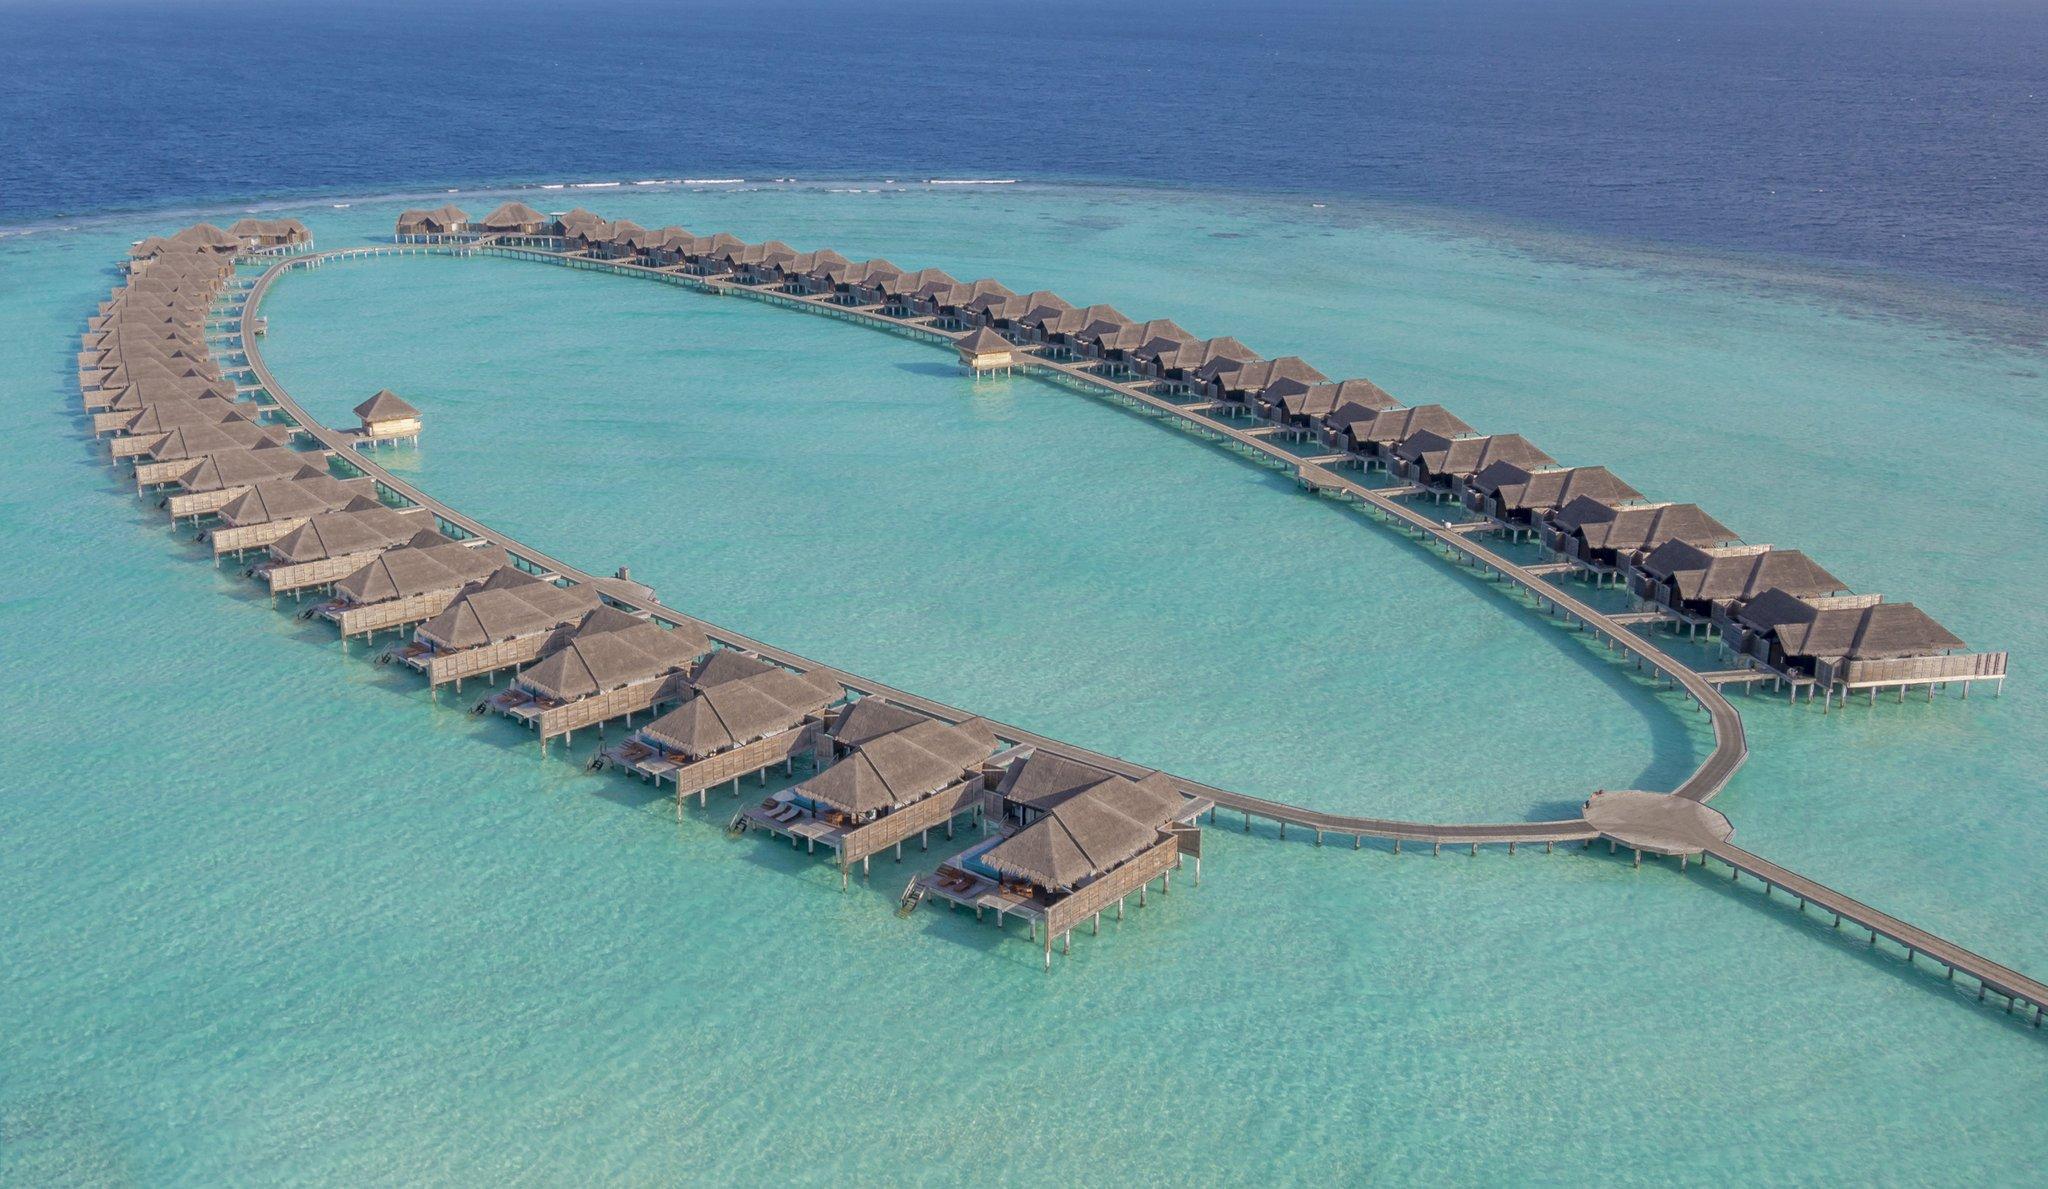 Maldives Anantara Kihavah 16 Overwater Villas daytime_aerial